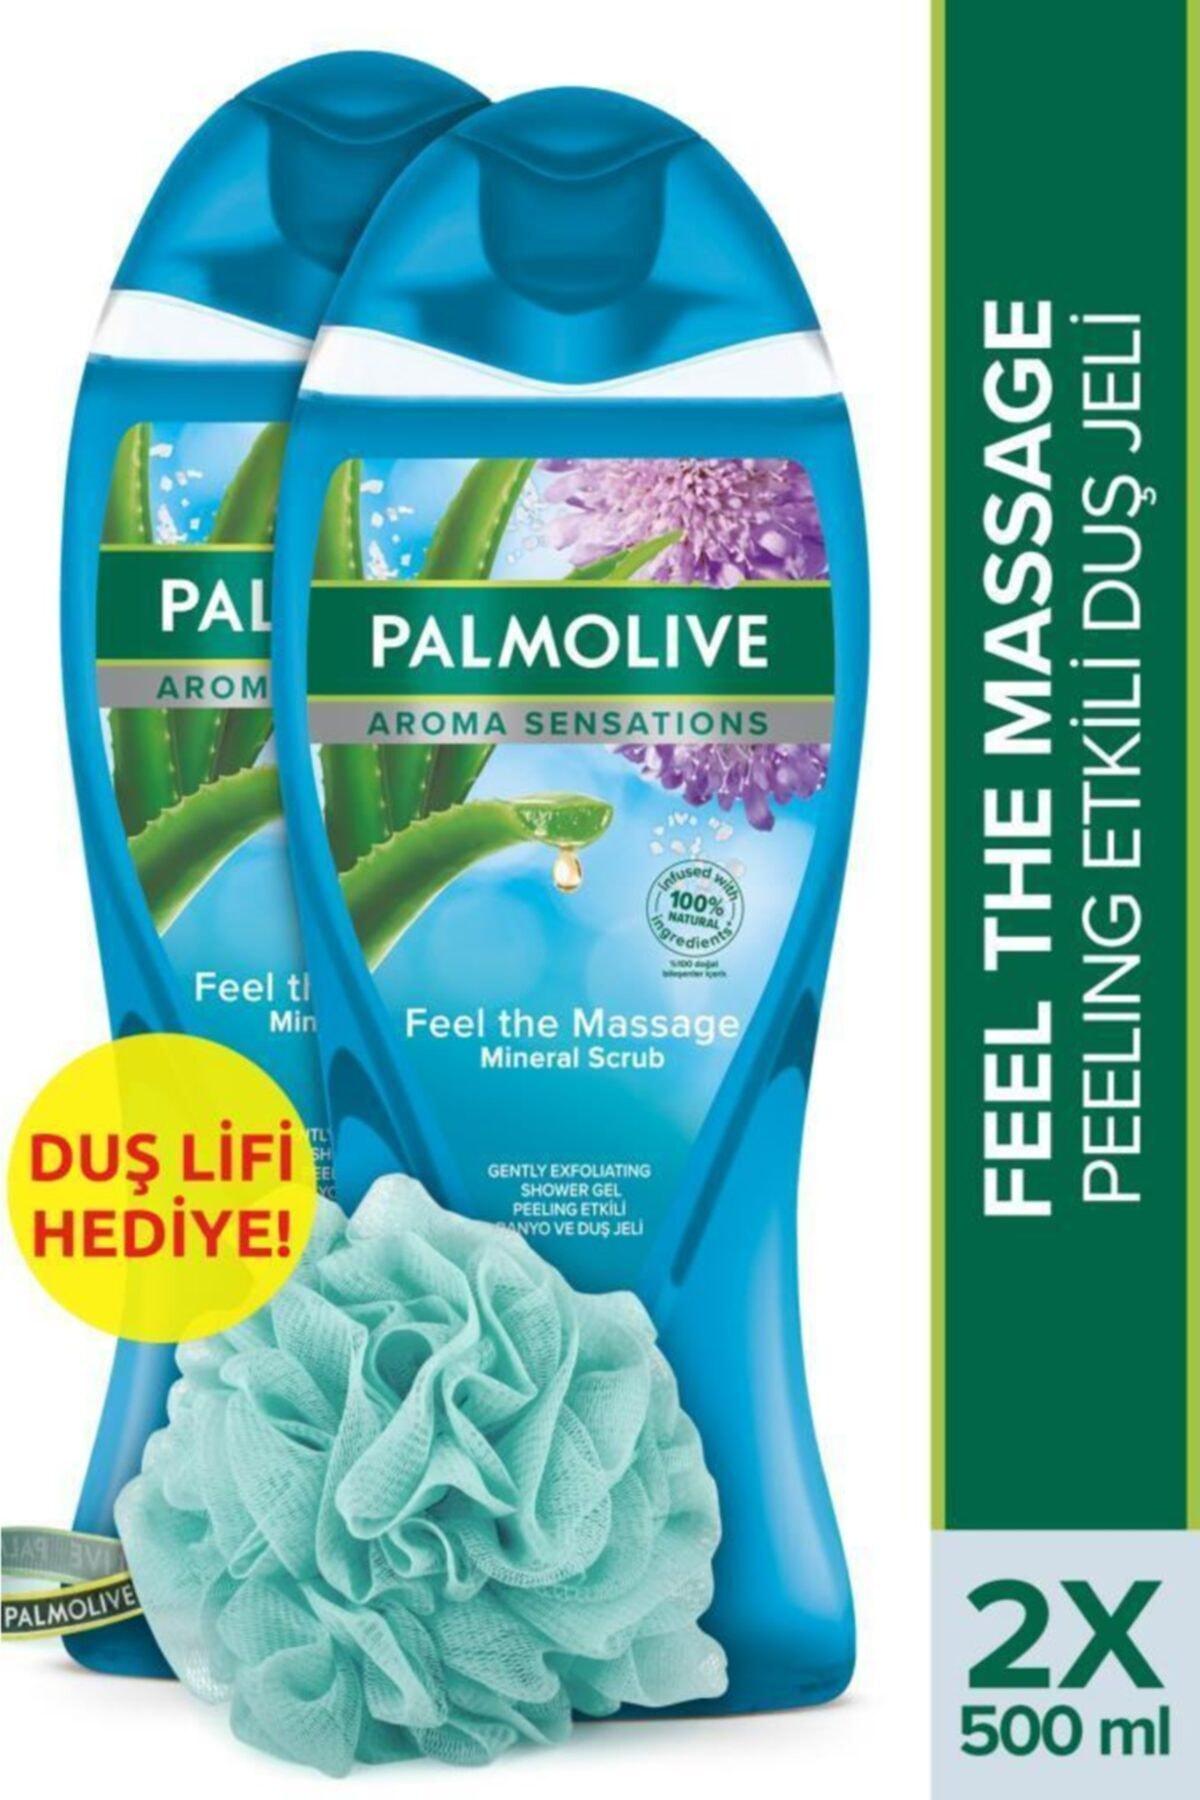 Palmolive Aroma Sensations Feel The Massage Cilt Yenileyici Duş Jeli 2 X 500 ml + Duş Lifi Hediye 1